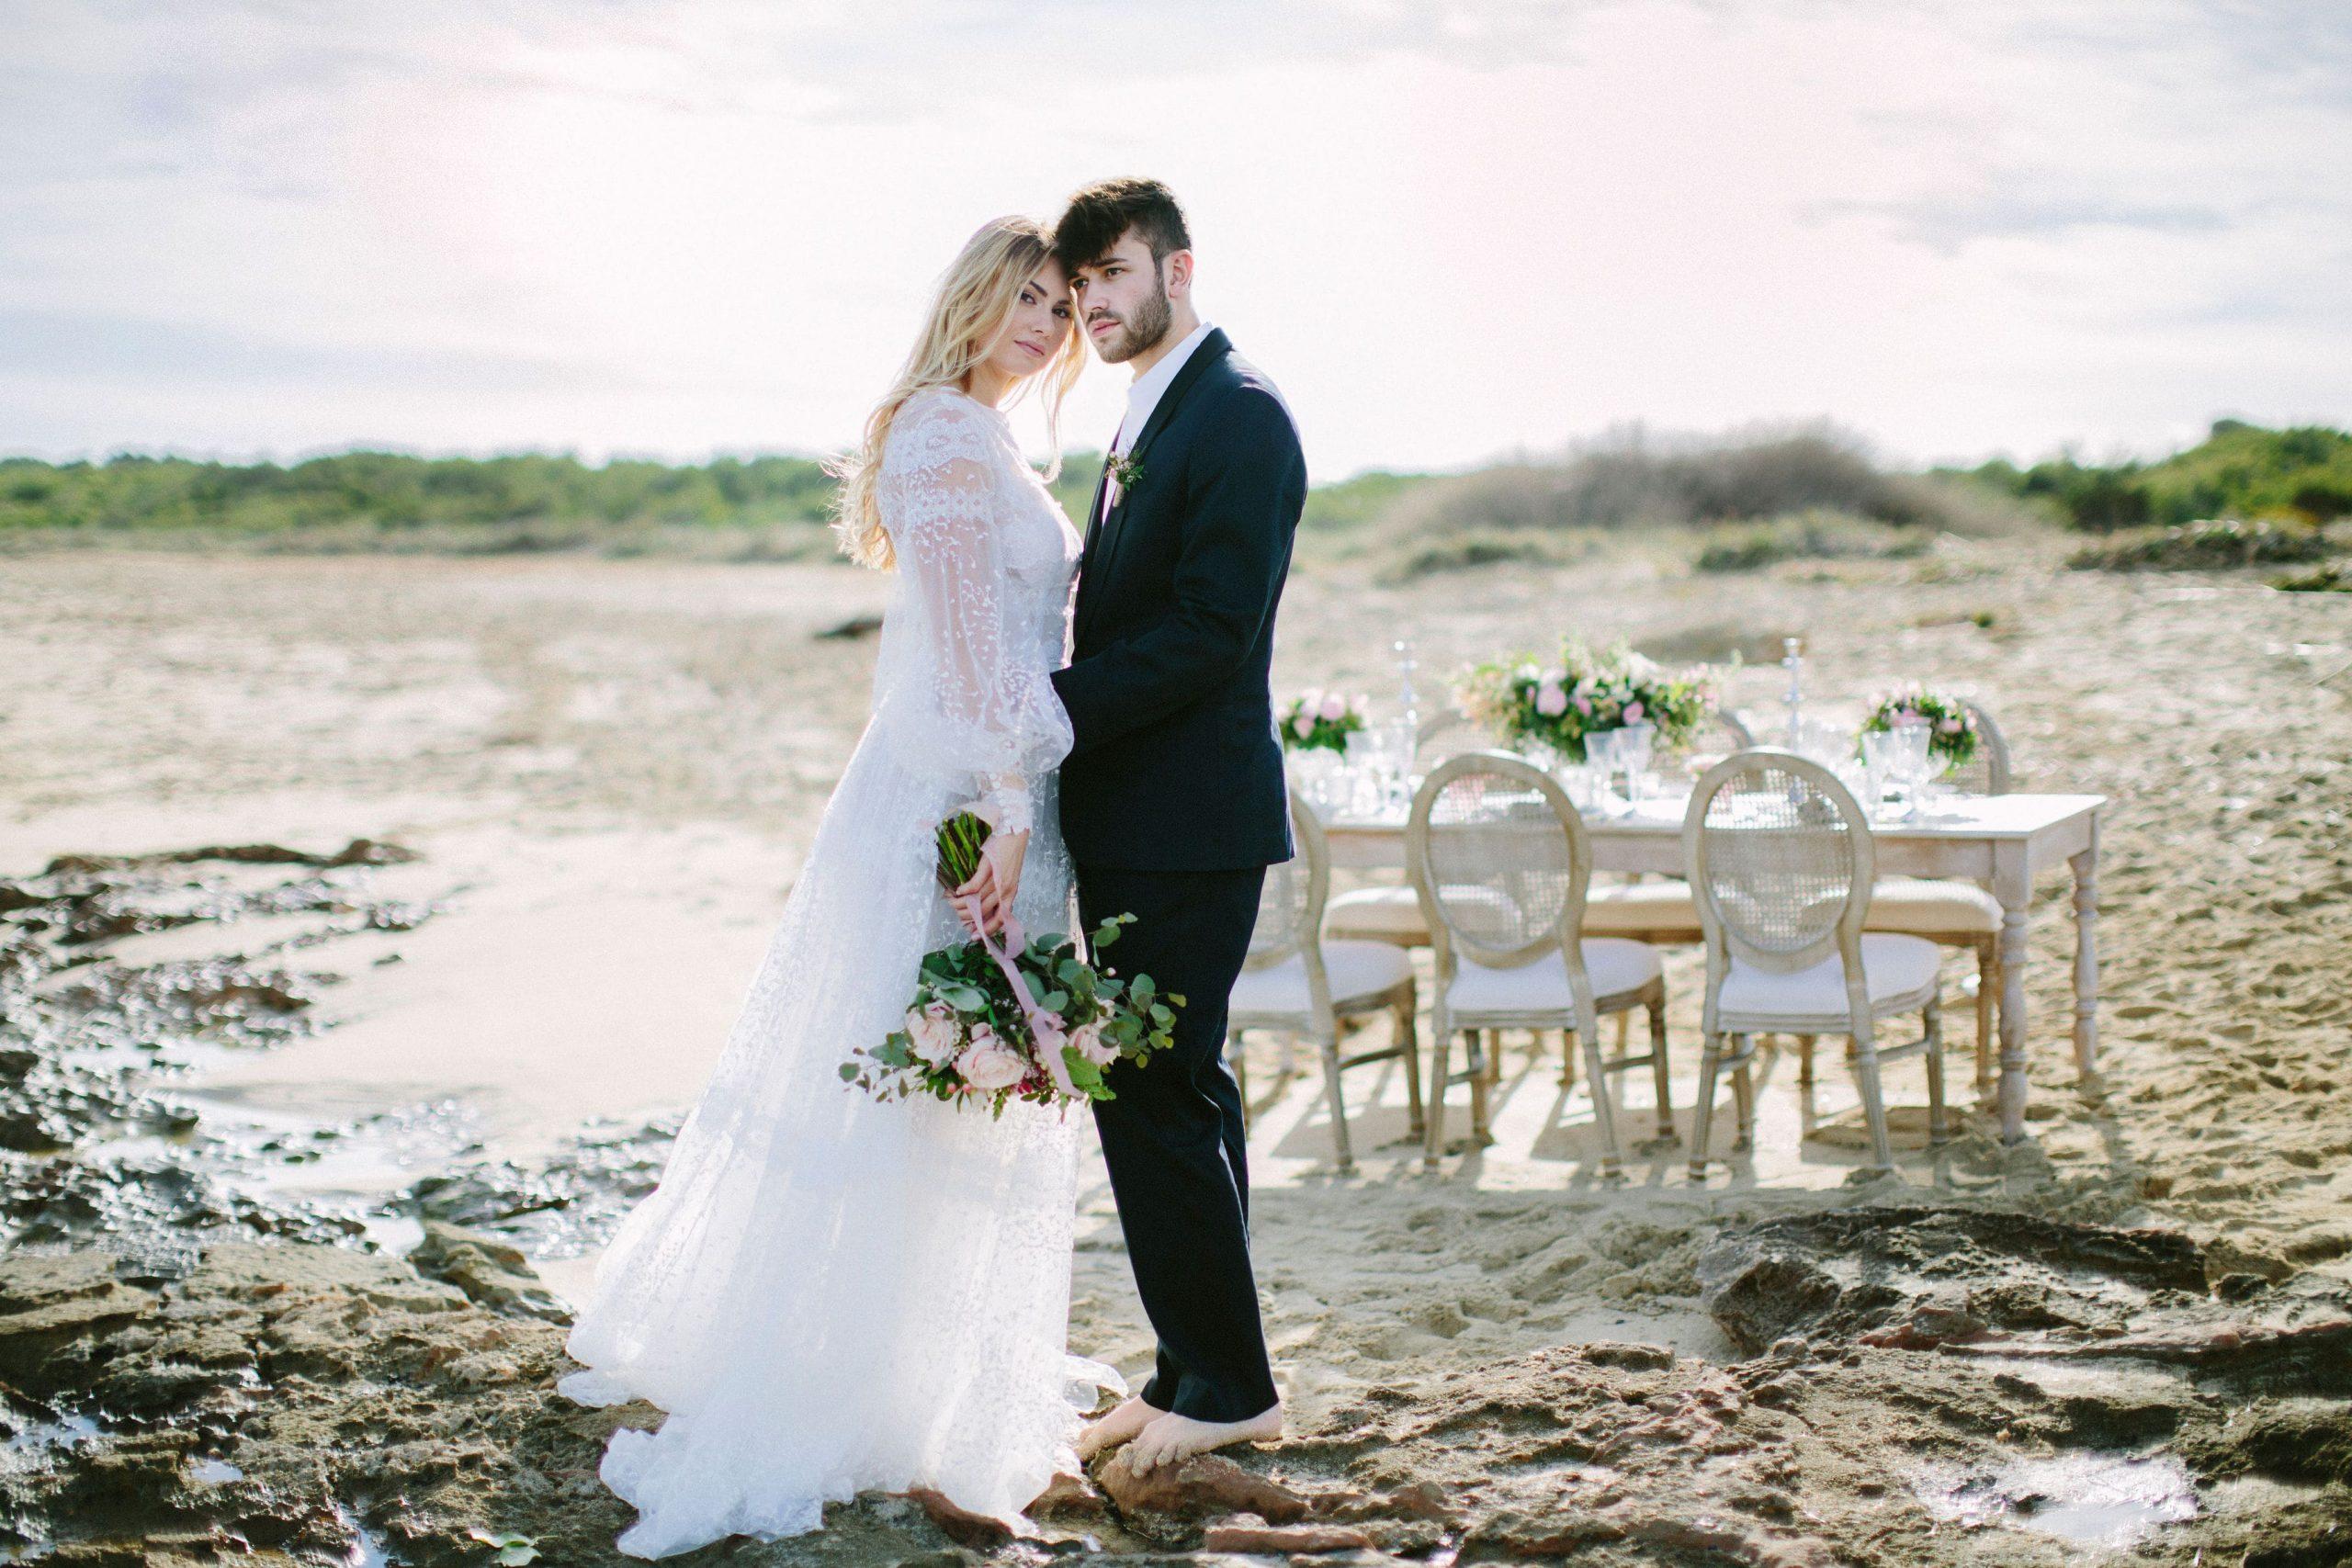 Wedding by the sea in Majorca